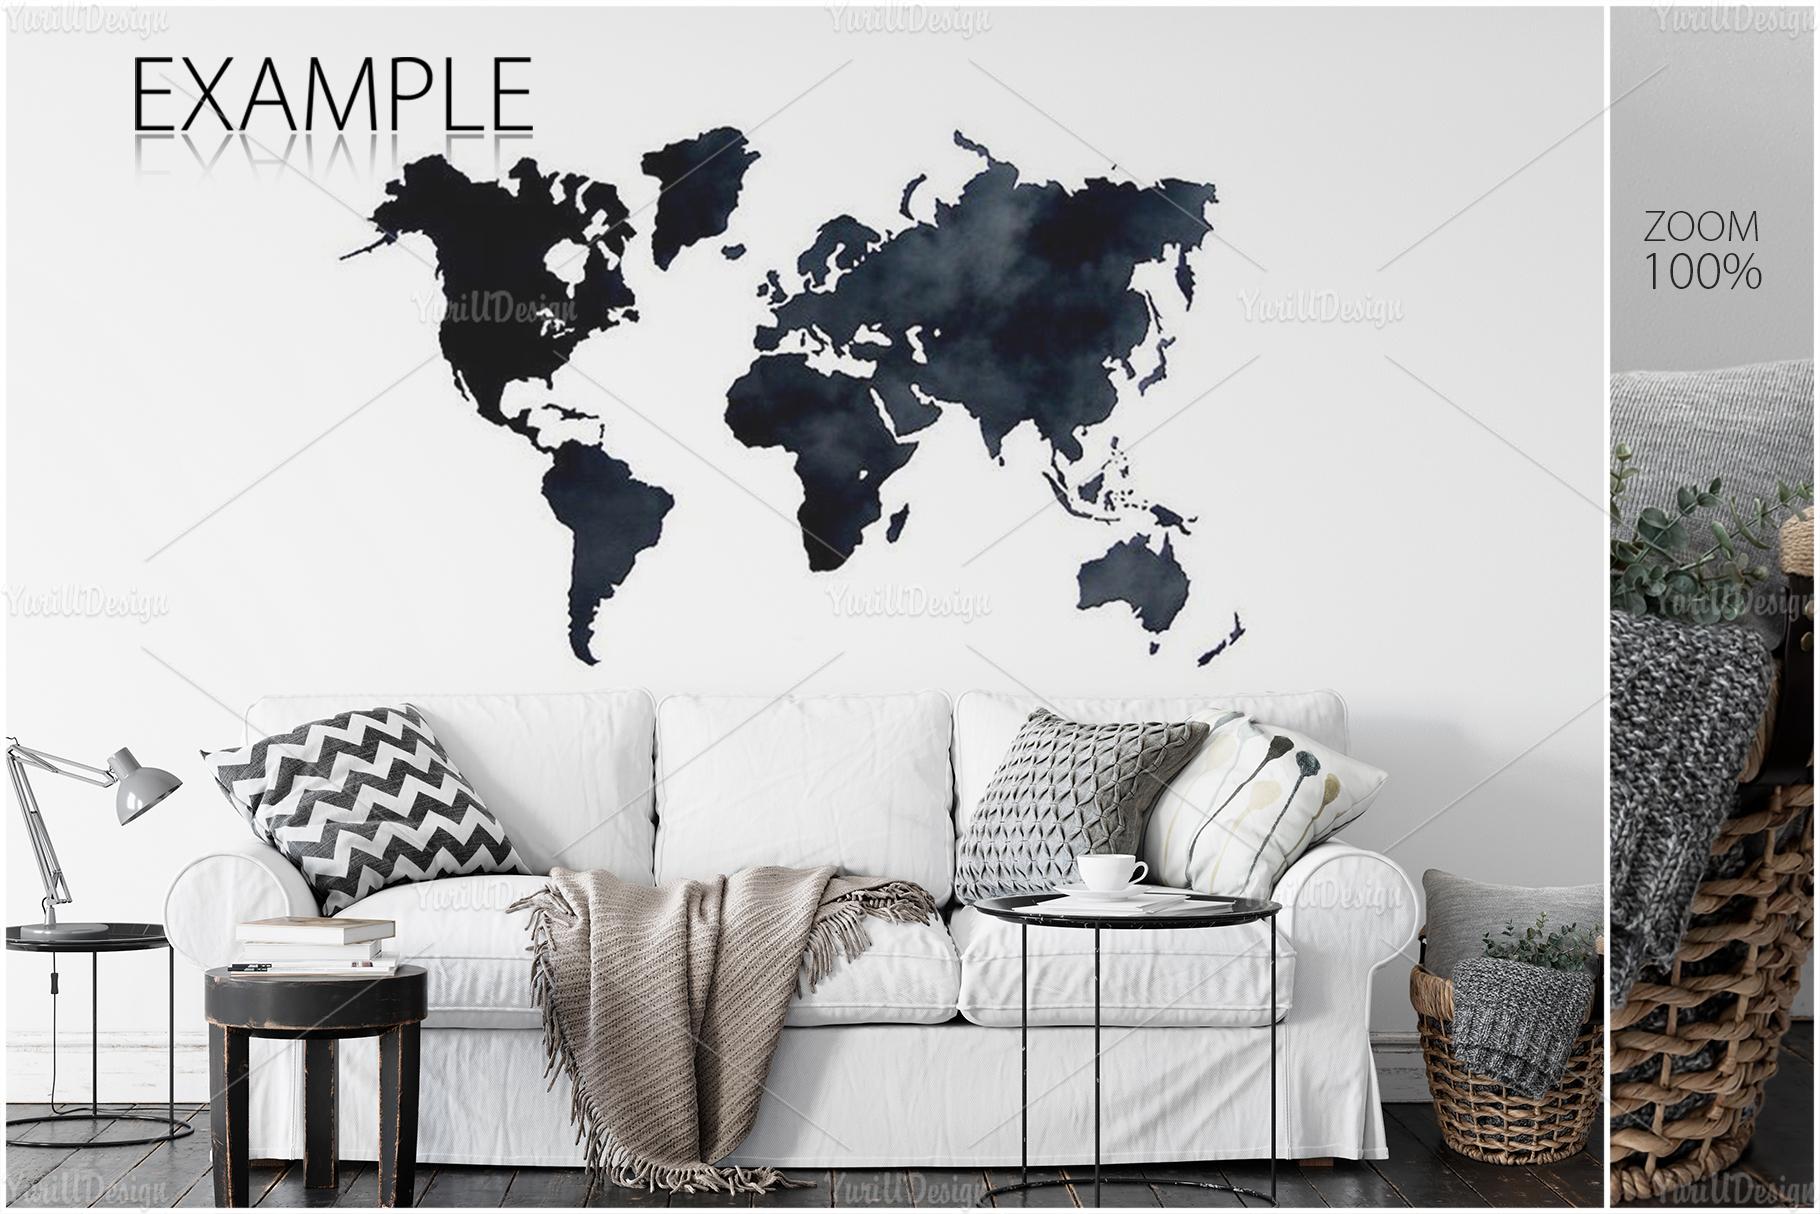 Scandinavian Interior Frames & Walls Mockup Bundle - 3 example image 12